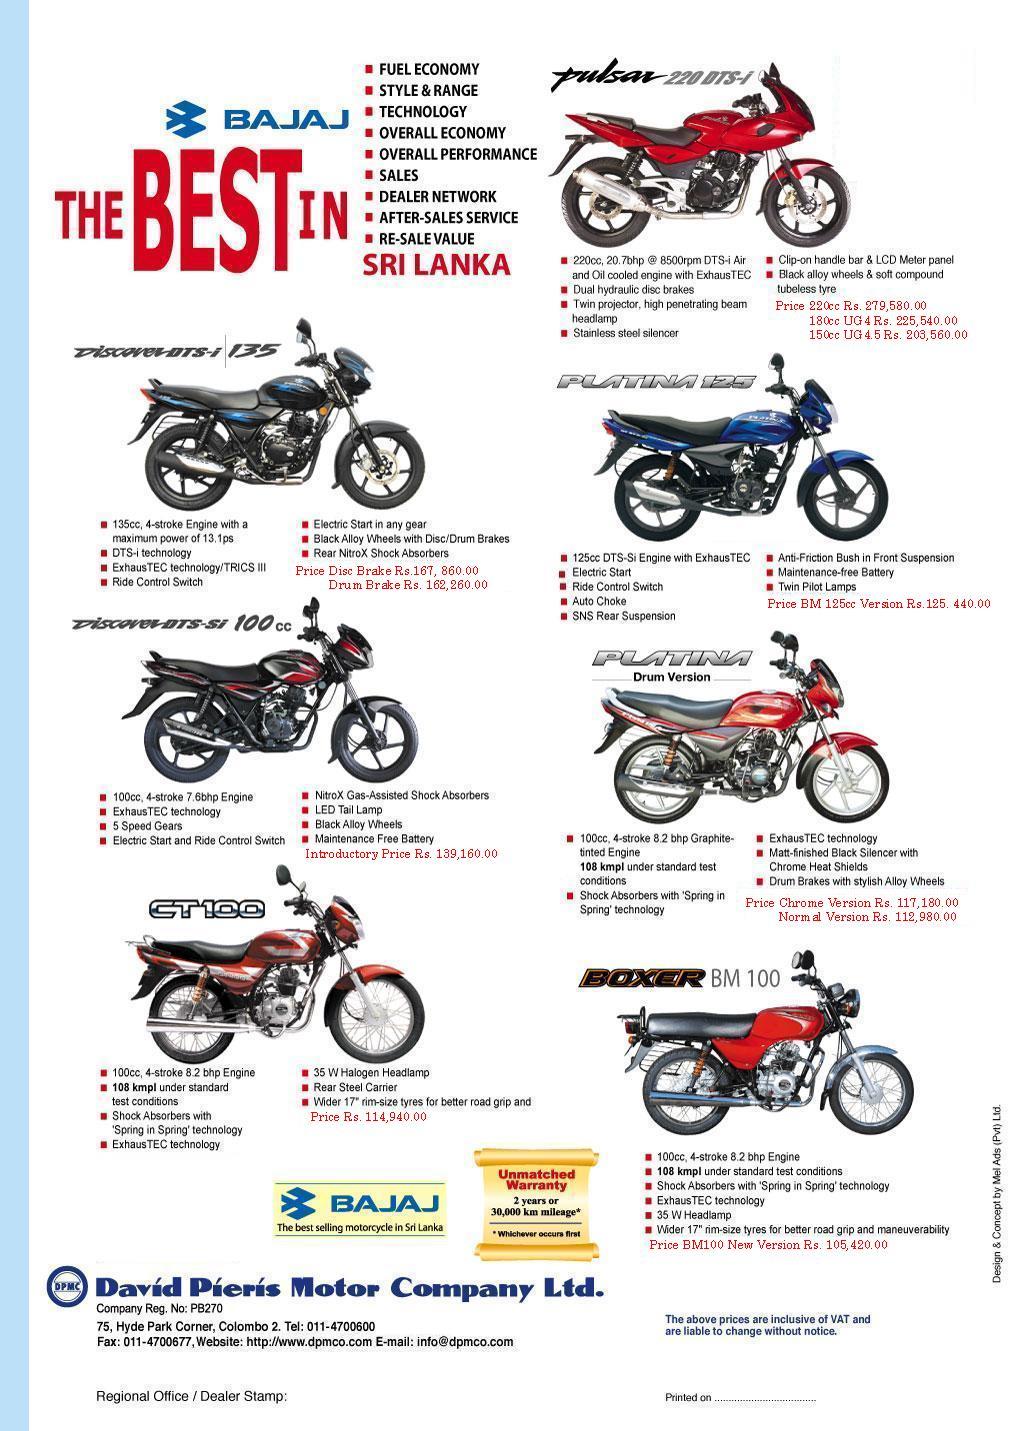 Bajaj Bike Price List Sri Lanka 2010 July Lanka Automotives